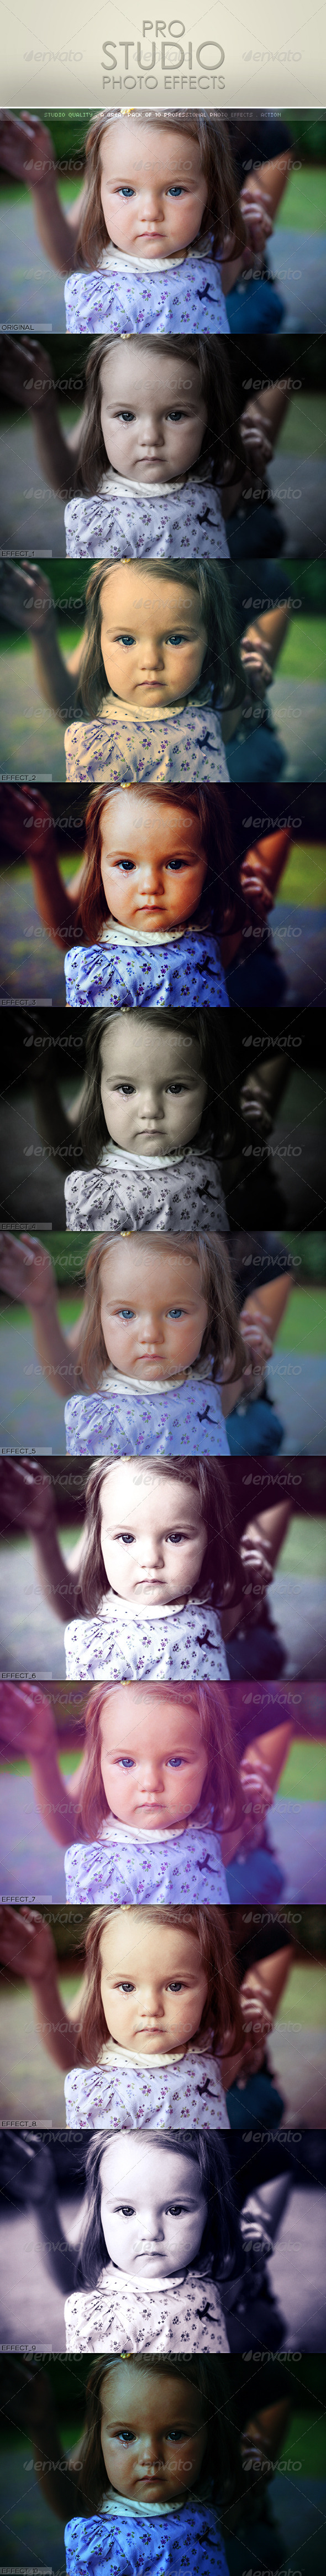 GraphicRiver 10 Pro Studio Photo Effect Actions 573741